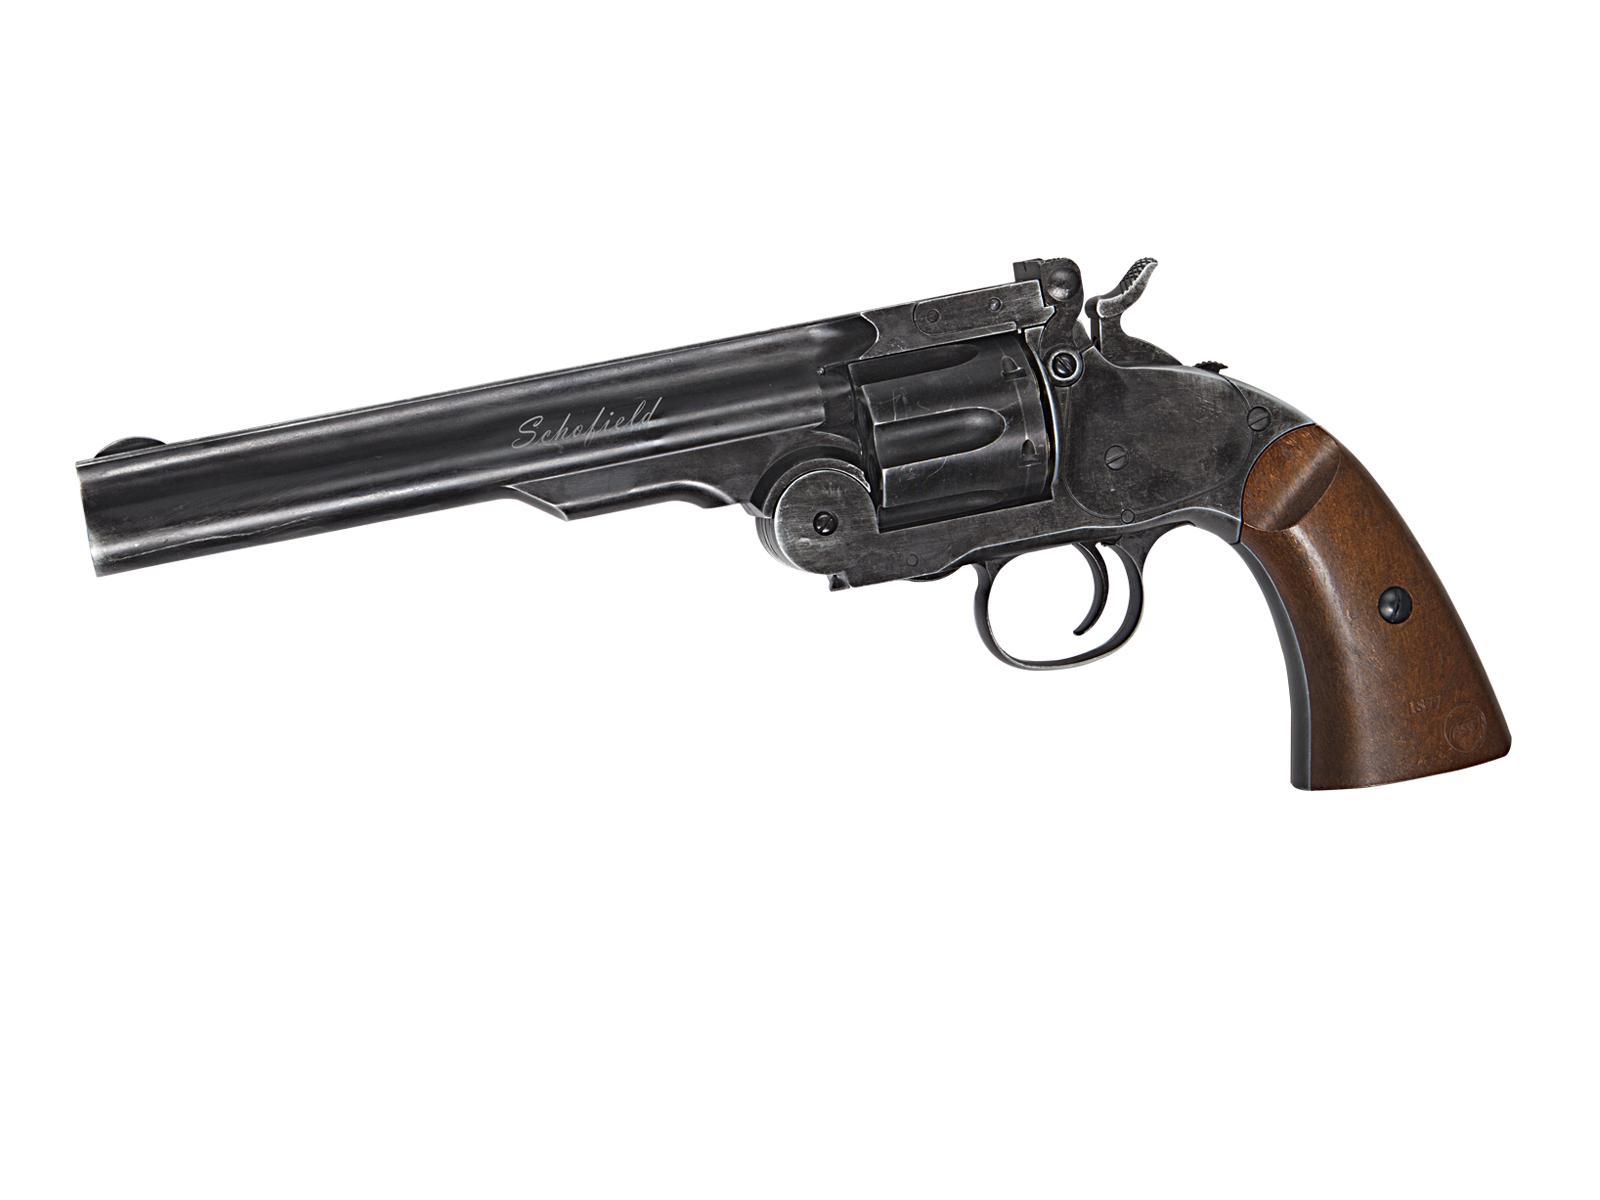 Revolver Model Schofield 6 Inch - Aging Bk - Wooden Grip imagine